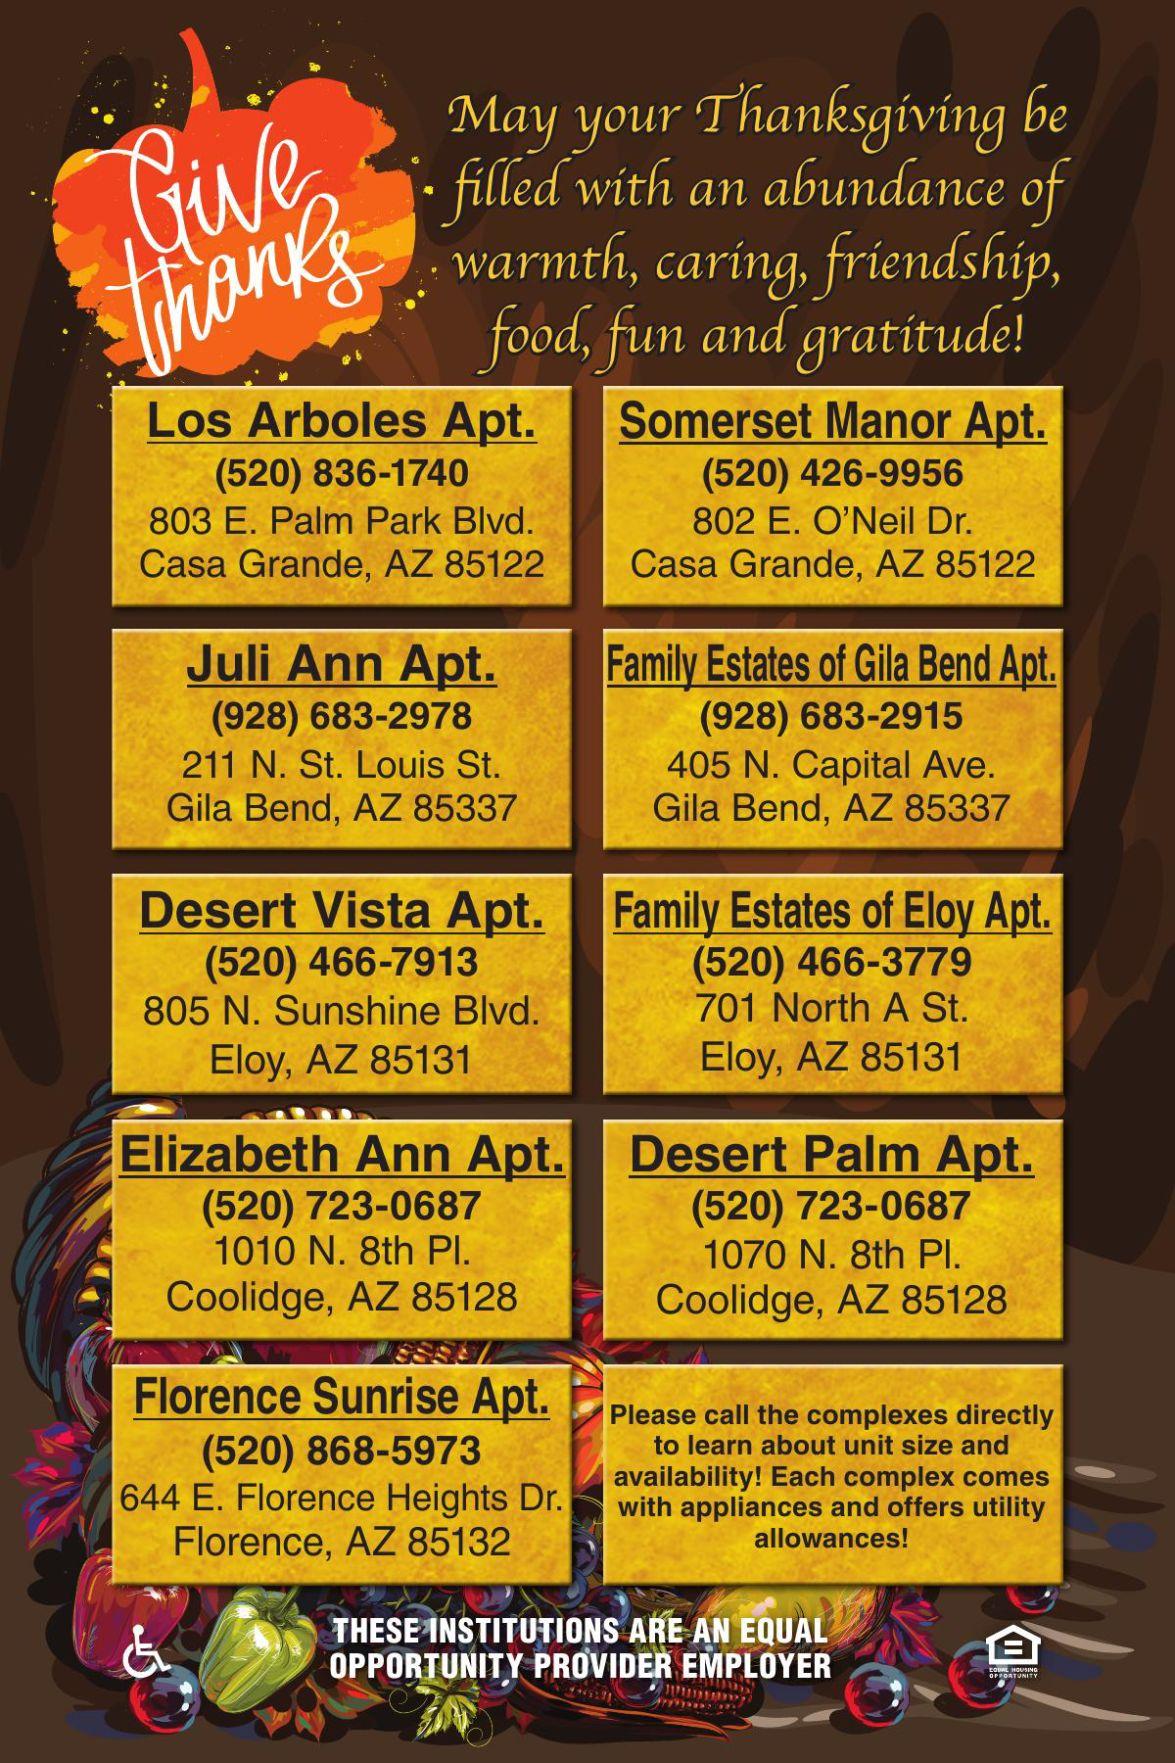 Landmark Aptartments - May your Thanksgiving be